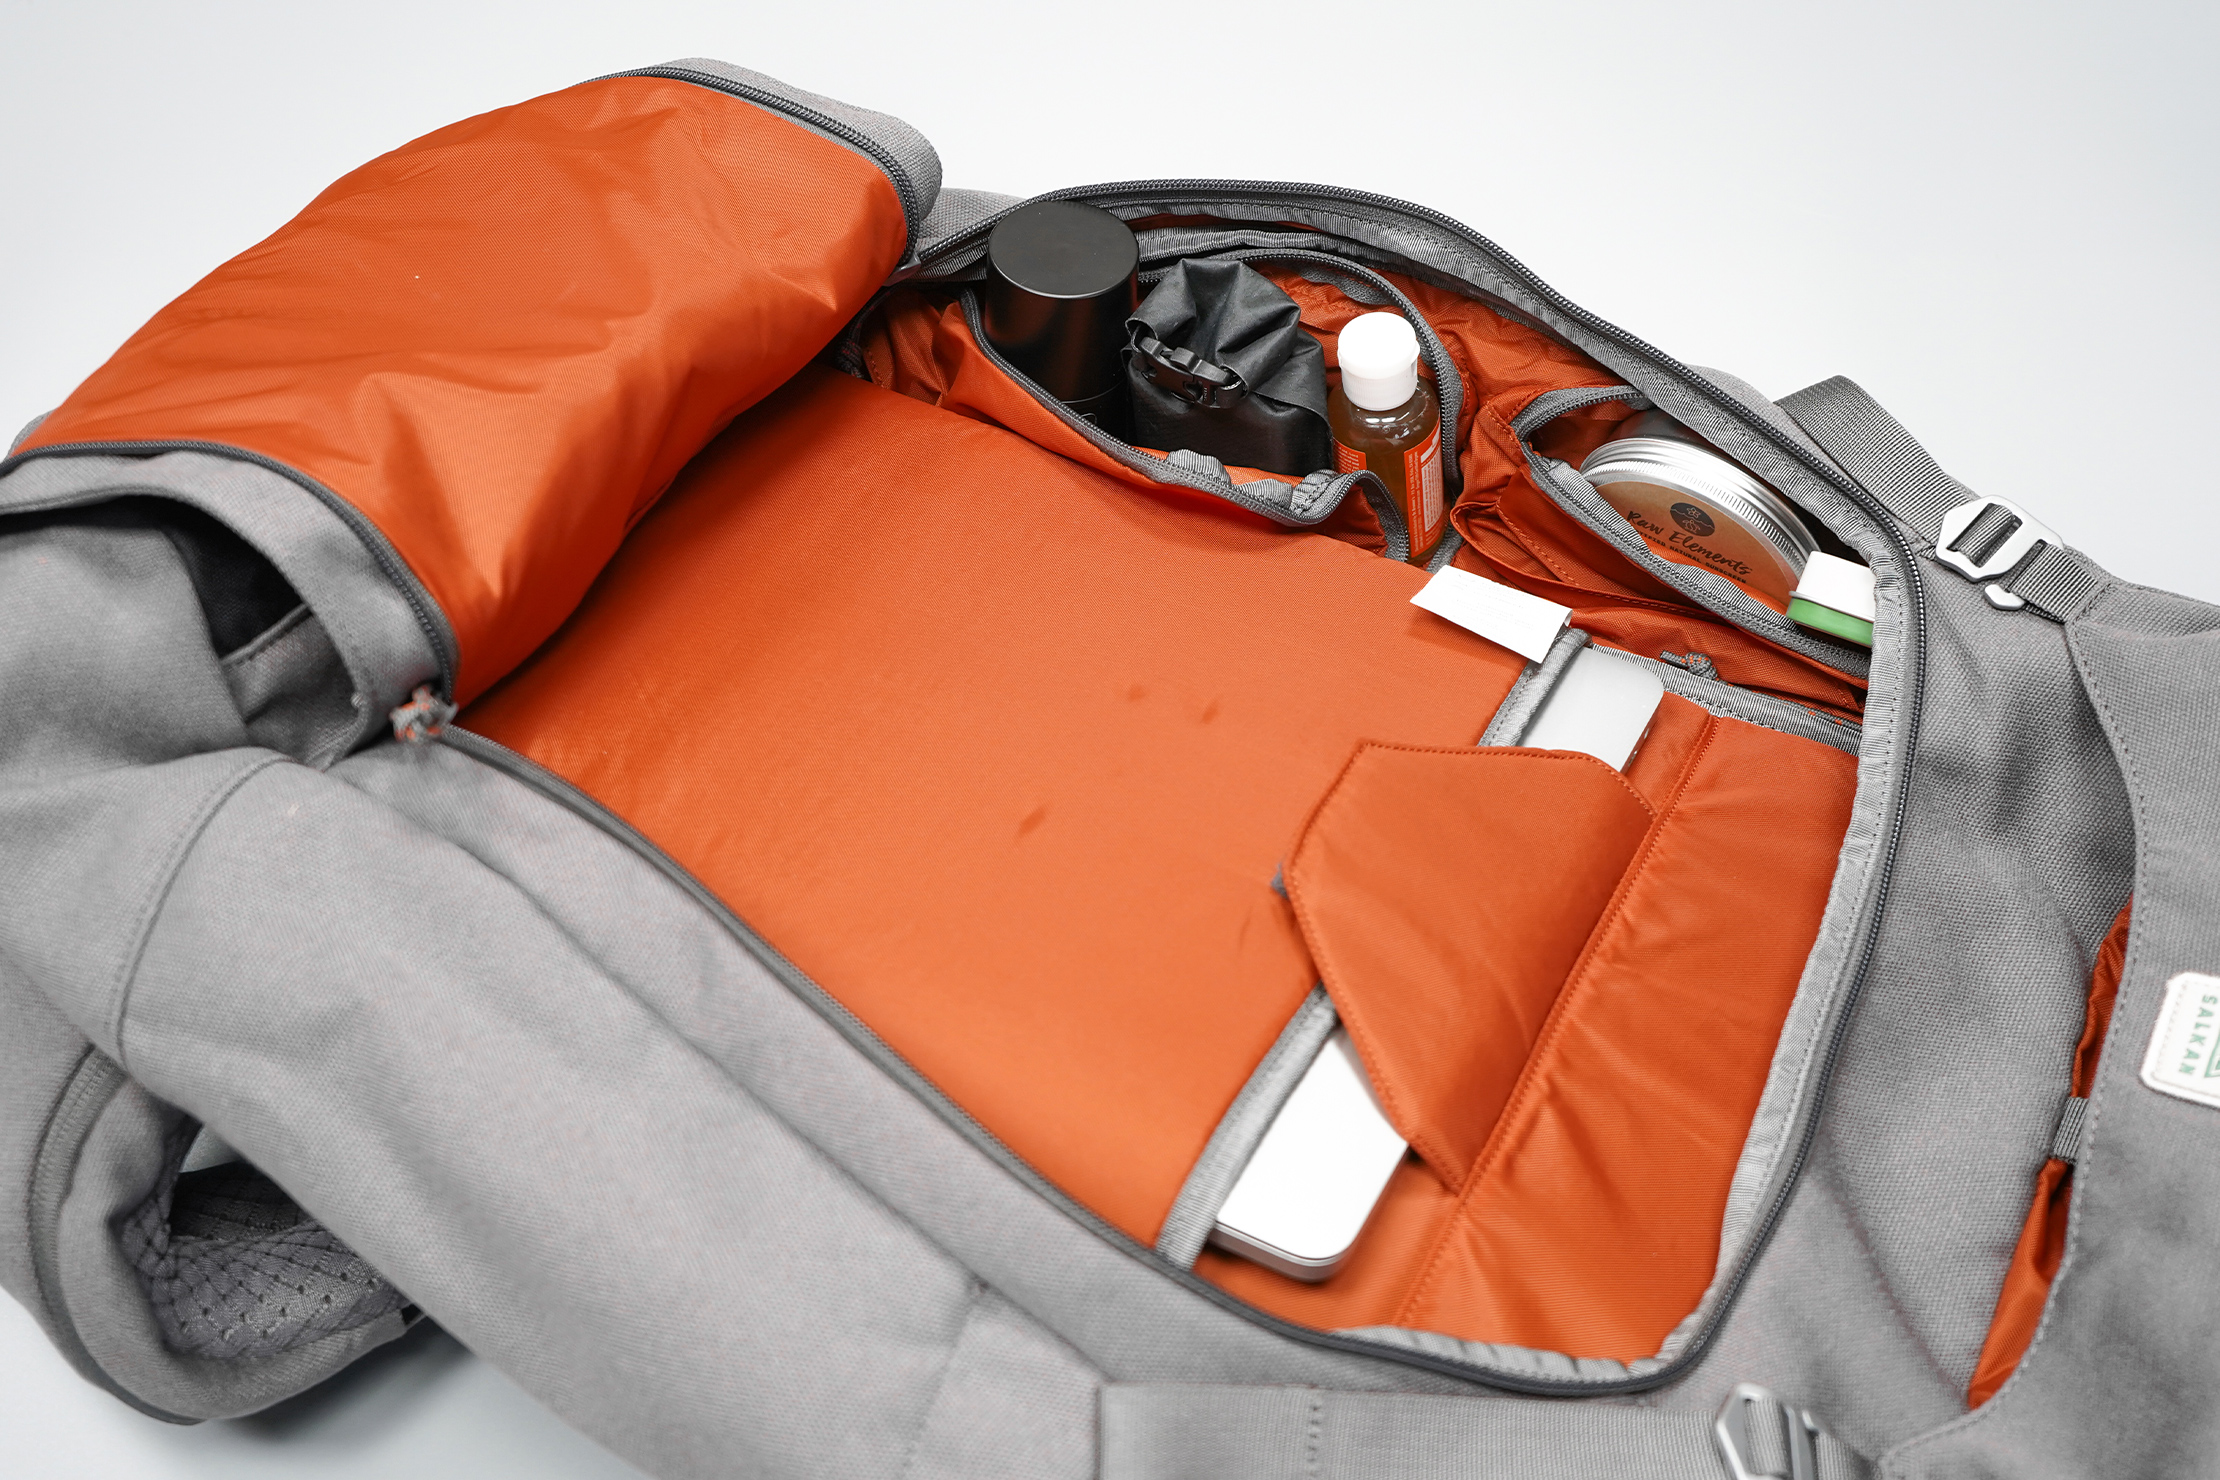 Salkan Backpacker | Organization inside the Mainpack's main compartment